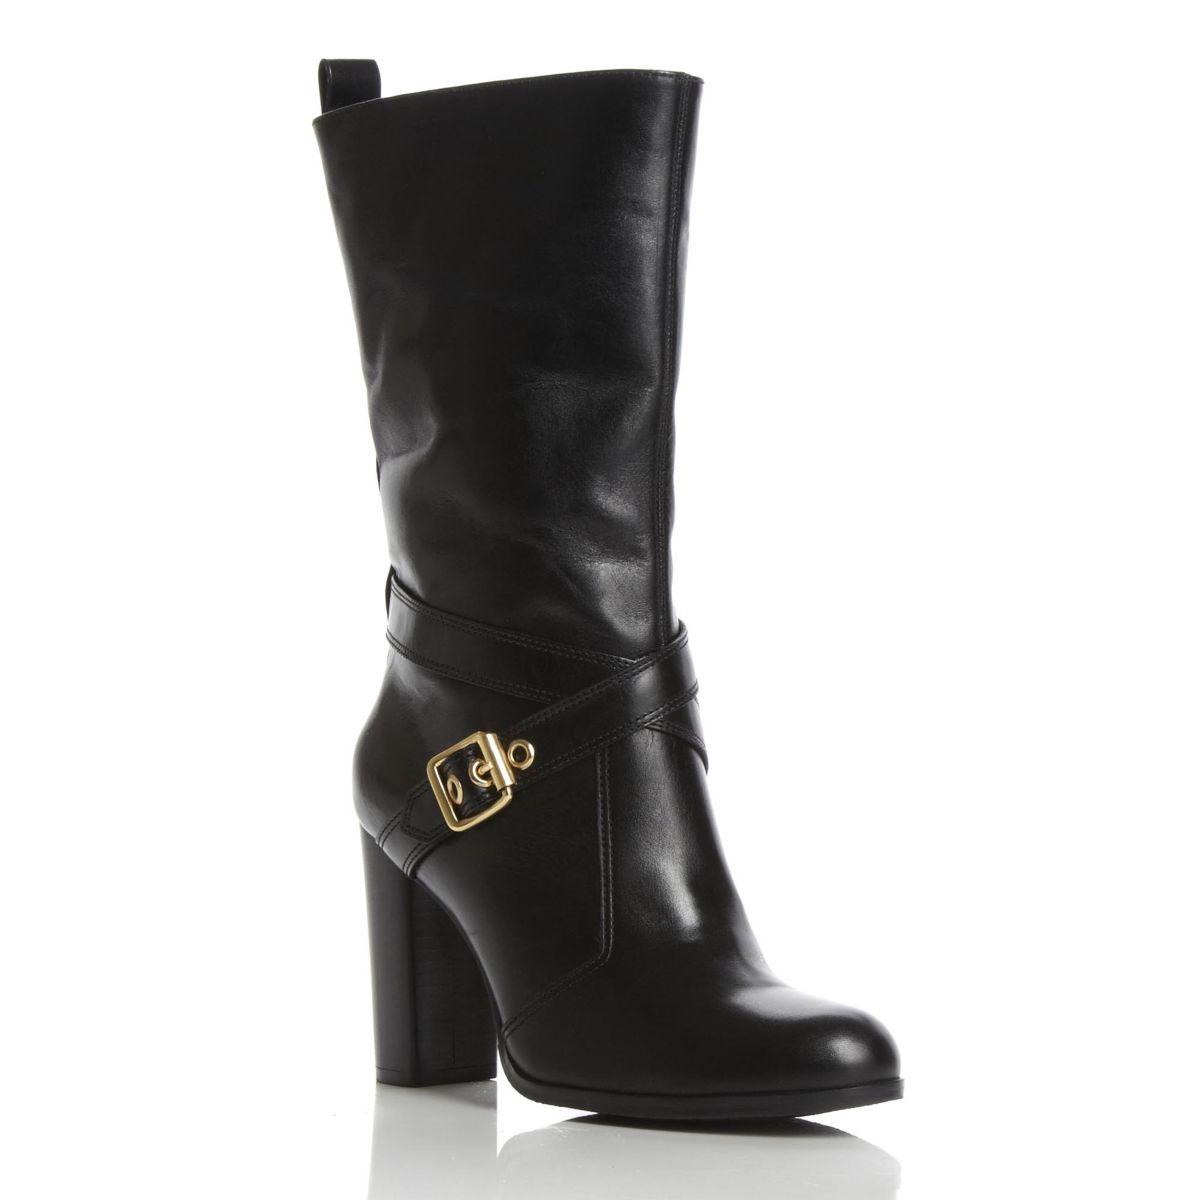 Model  1515 Women39s 10inch Combat Boot  Women39s Black Leather Military